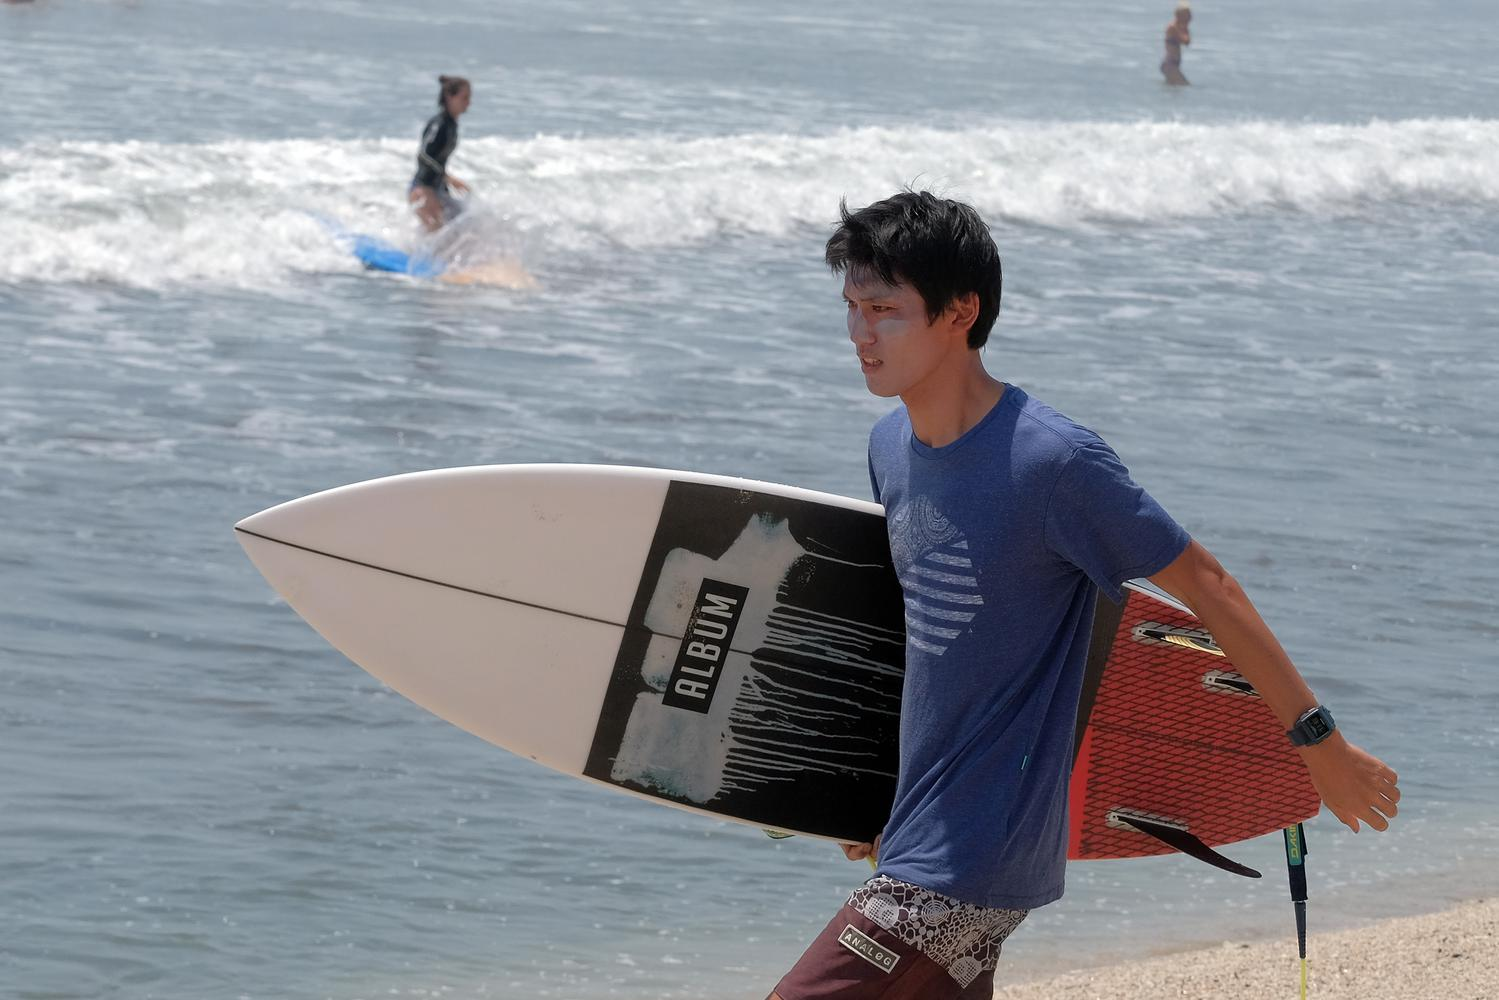 Wisatawan menggunakan krim pelindung kulit untuk mengurangi dampak sengatan sinar matahari saat berselancar di Pantai Kuta, Badung, Bali, Kamis (24/10/2019). Badan Meteorologi, Klimatologi, dan Geofisika (BMKG) menyatakan cuaca panas yang melanda wilayah